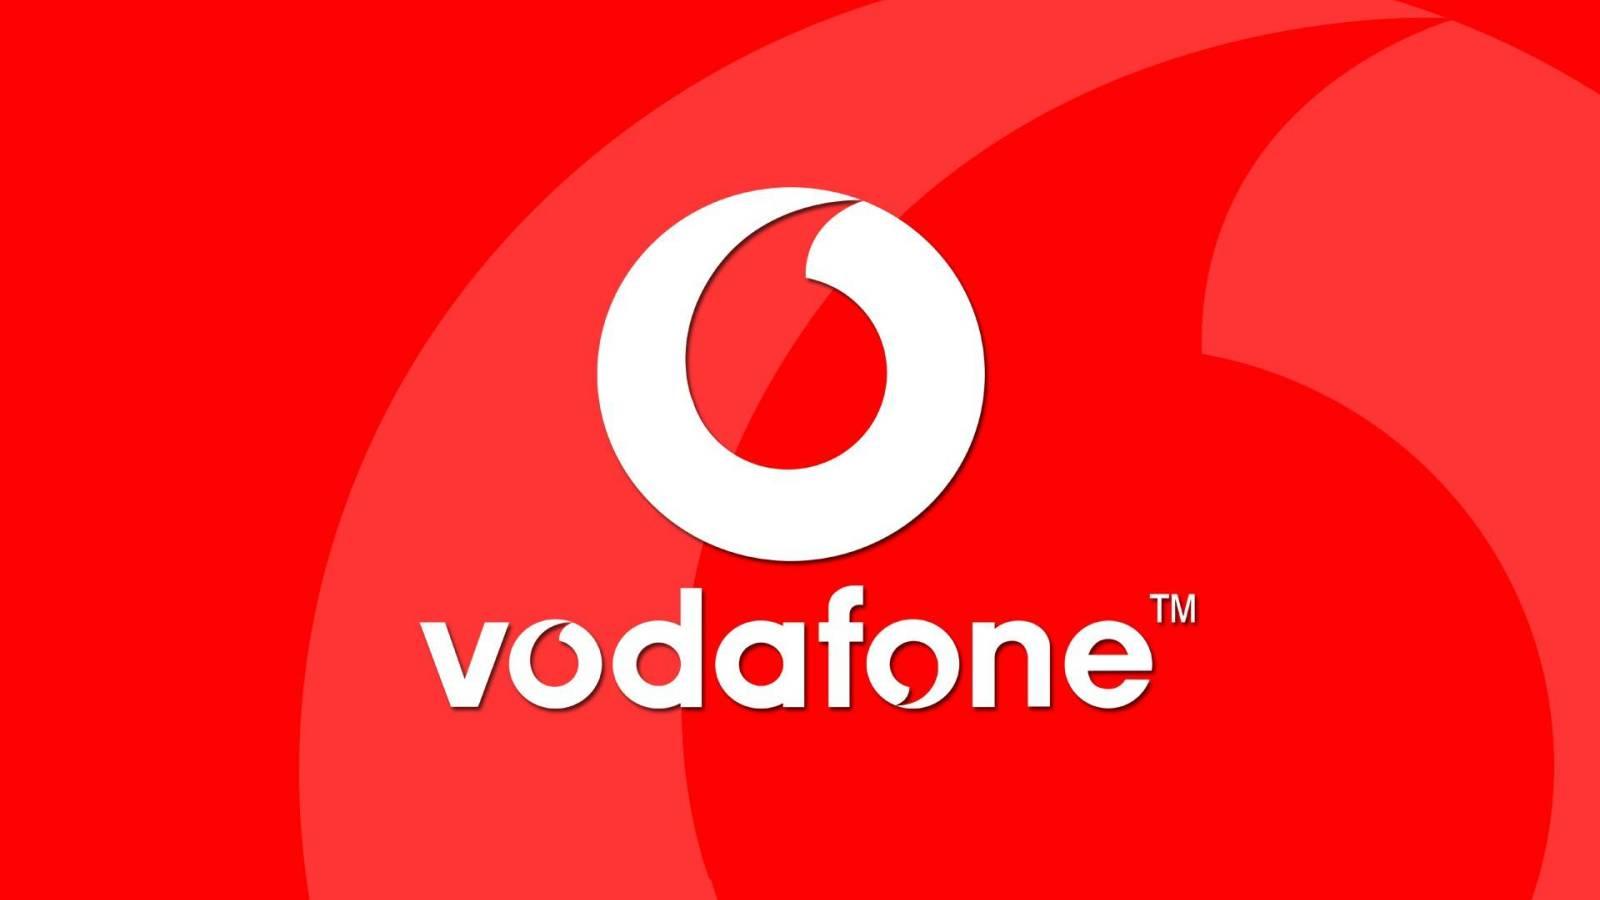 Vodafone comunicarea